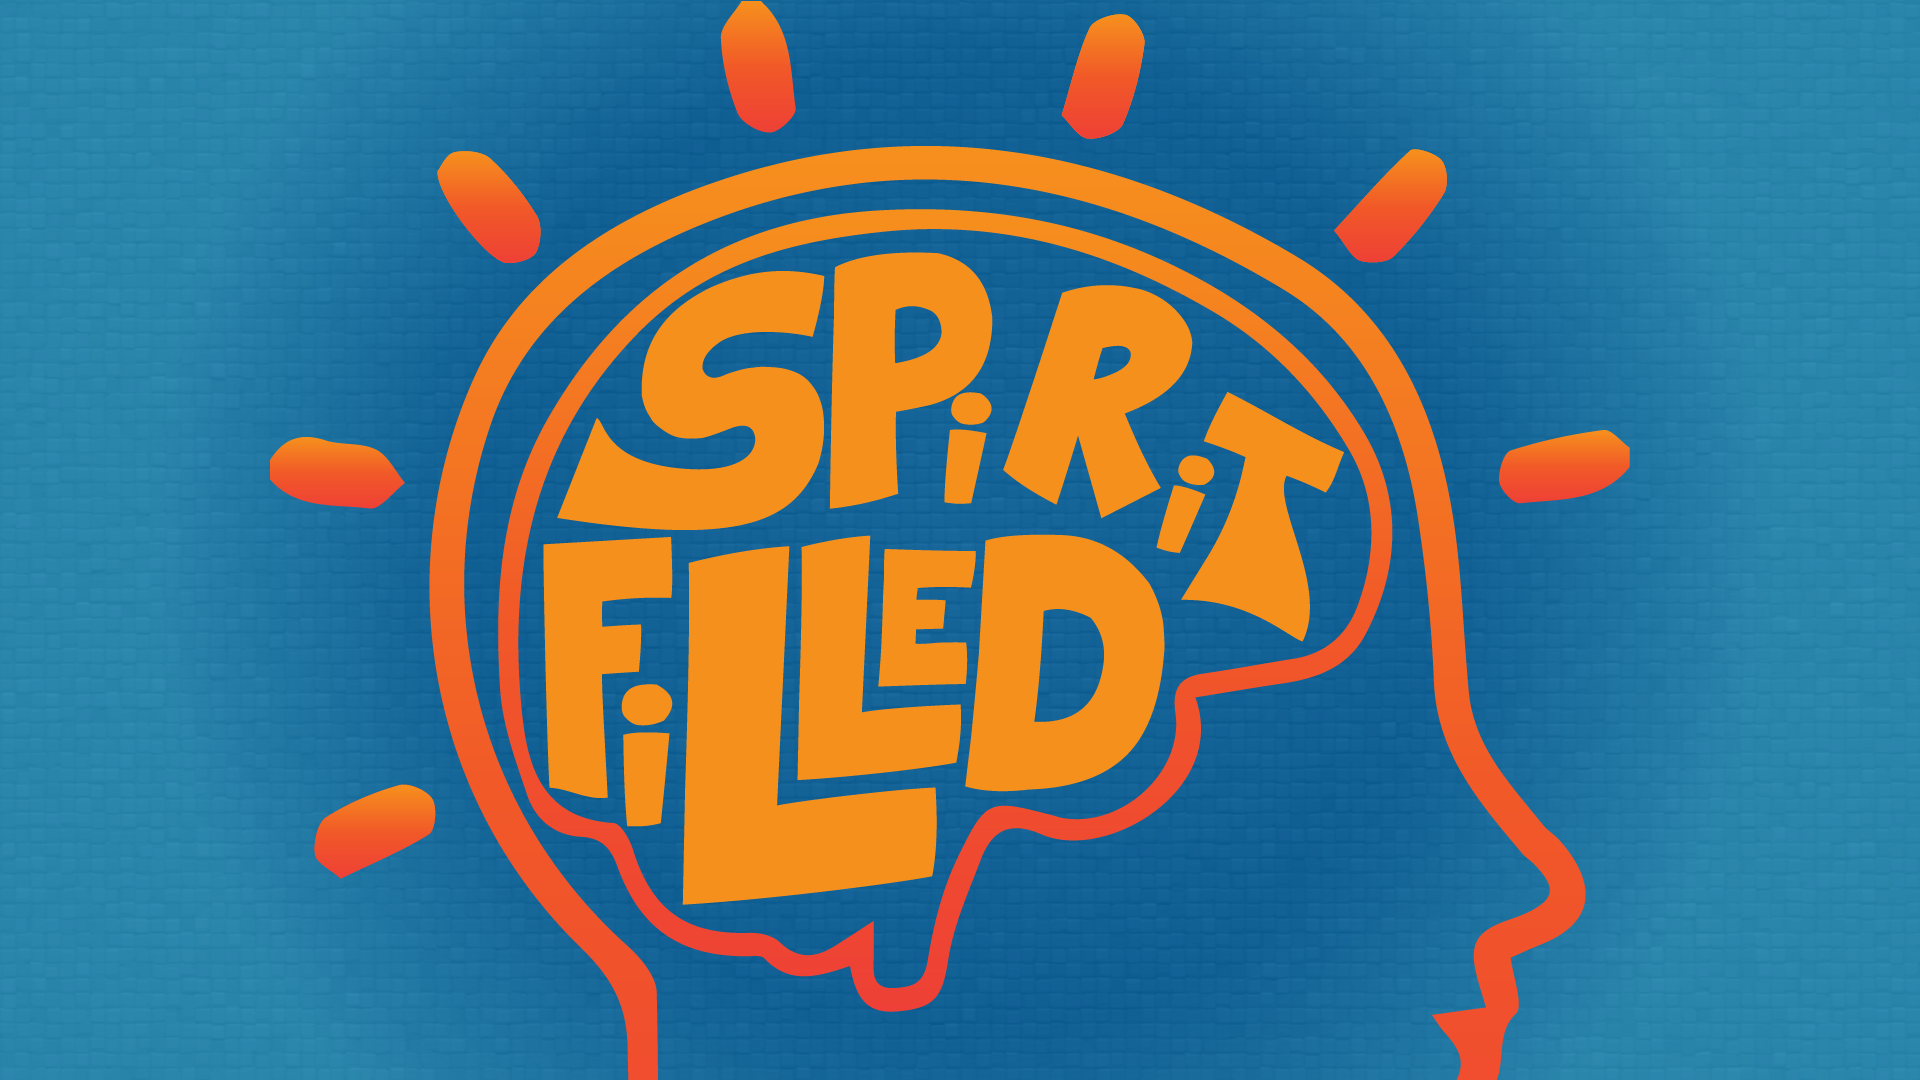 WIDEB-SPIRTFILLED.png